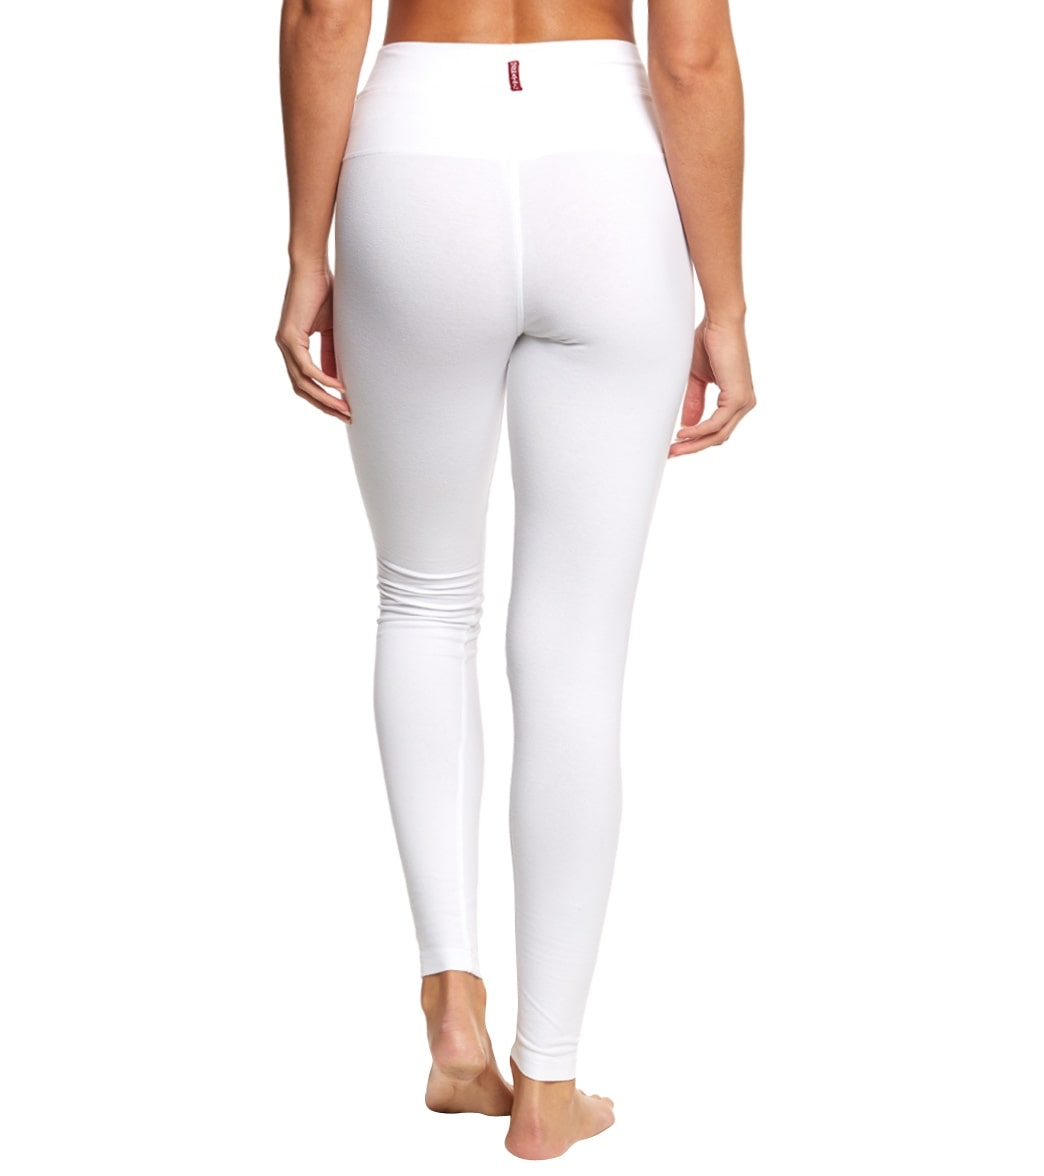 de2bfc694ef Hard Tail High Waisted Cotton Ankle Yoga Leggings at YogaOutlet.com ...